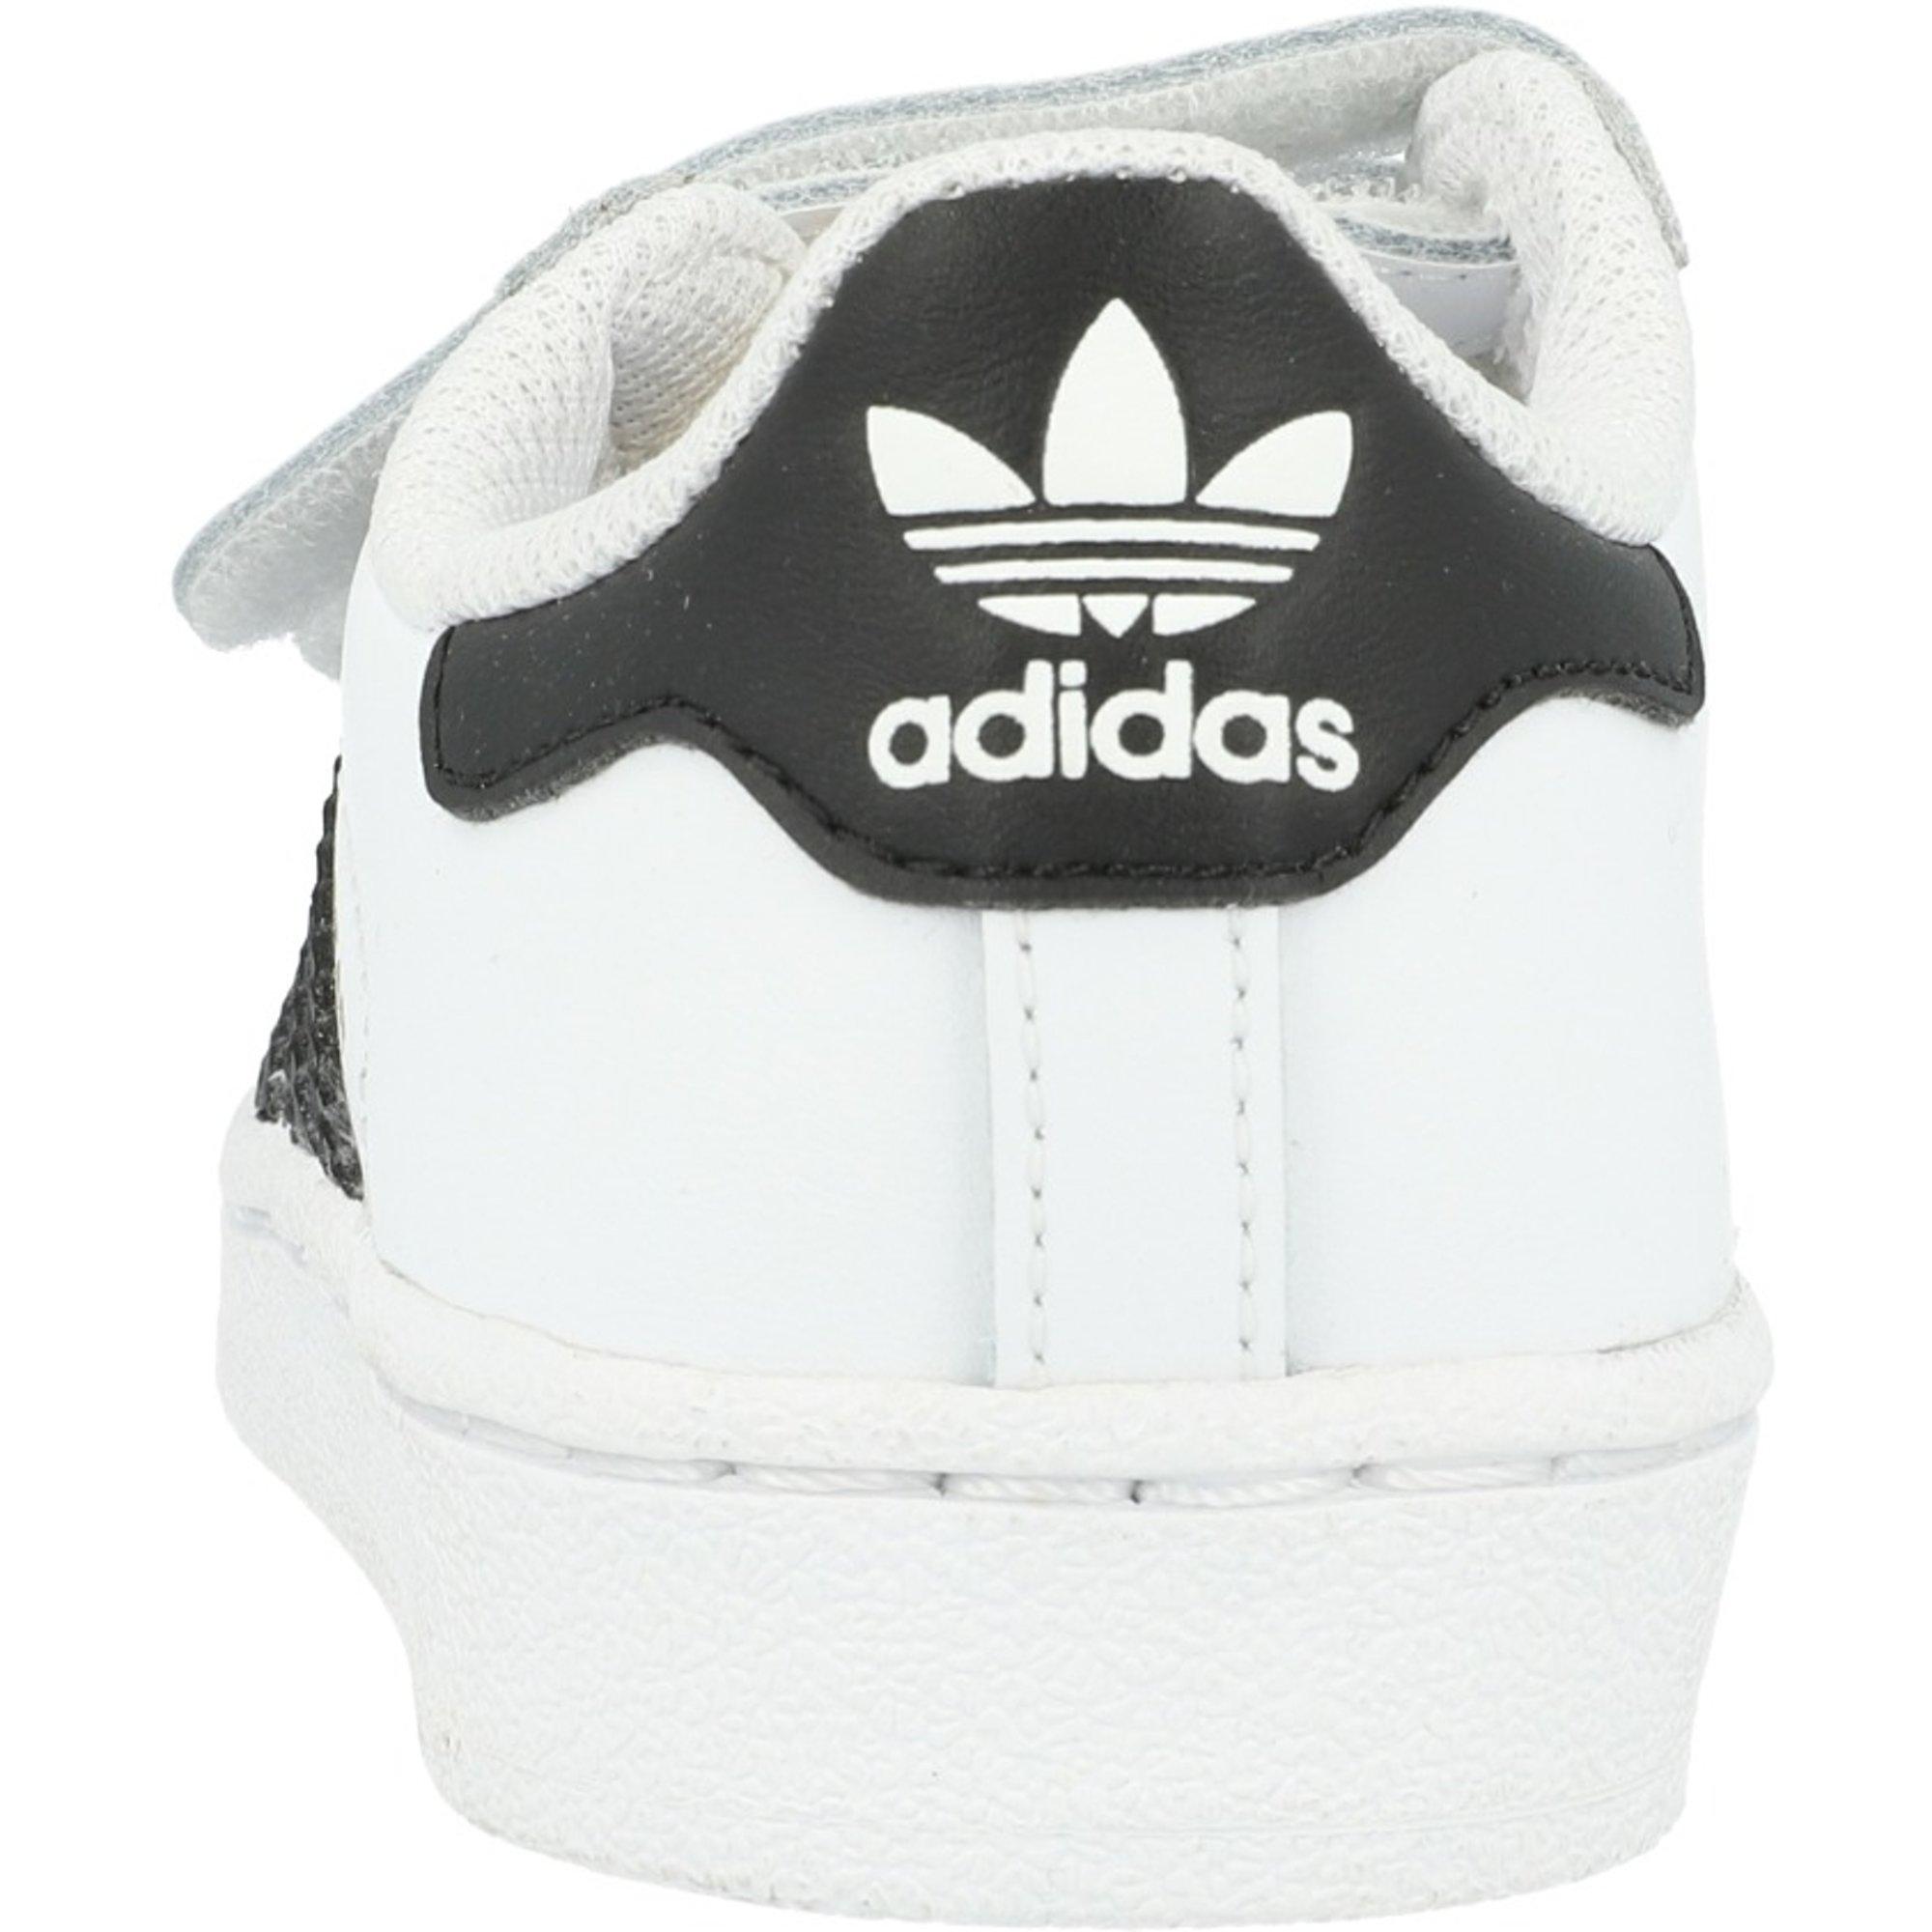 adidas Originals Superstar Foundation CF C White/Black Leather